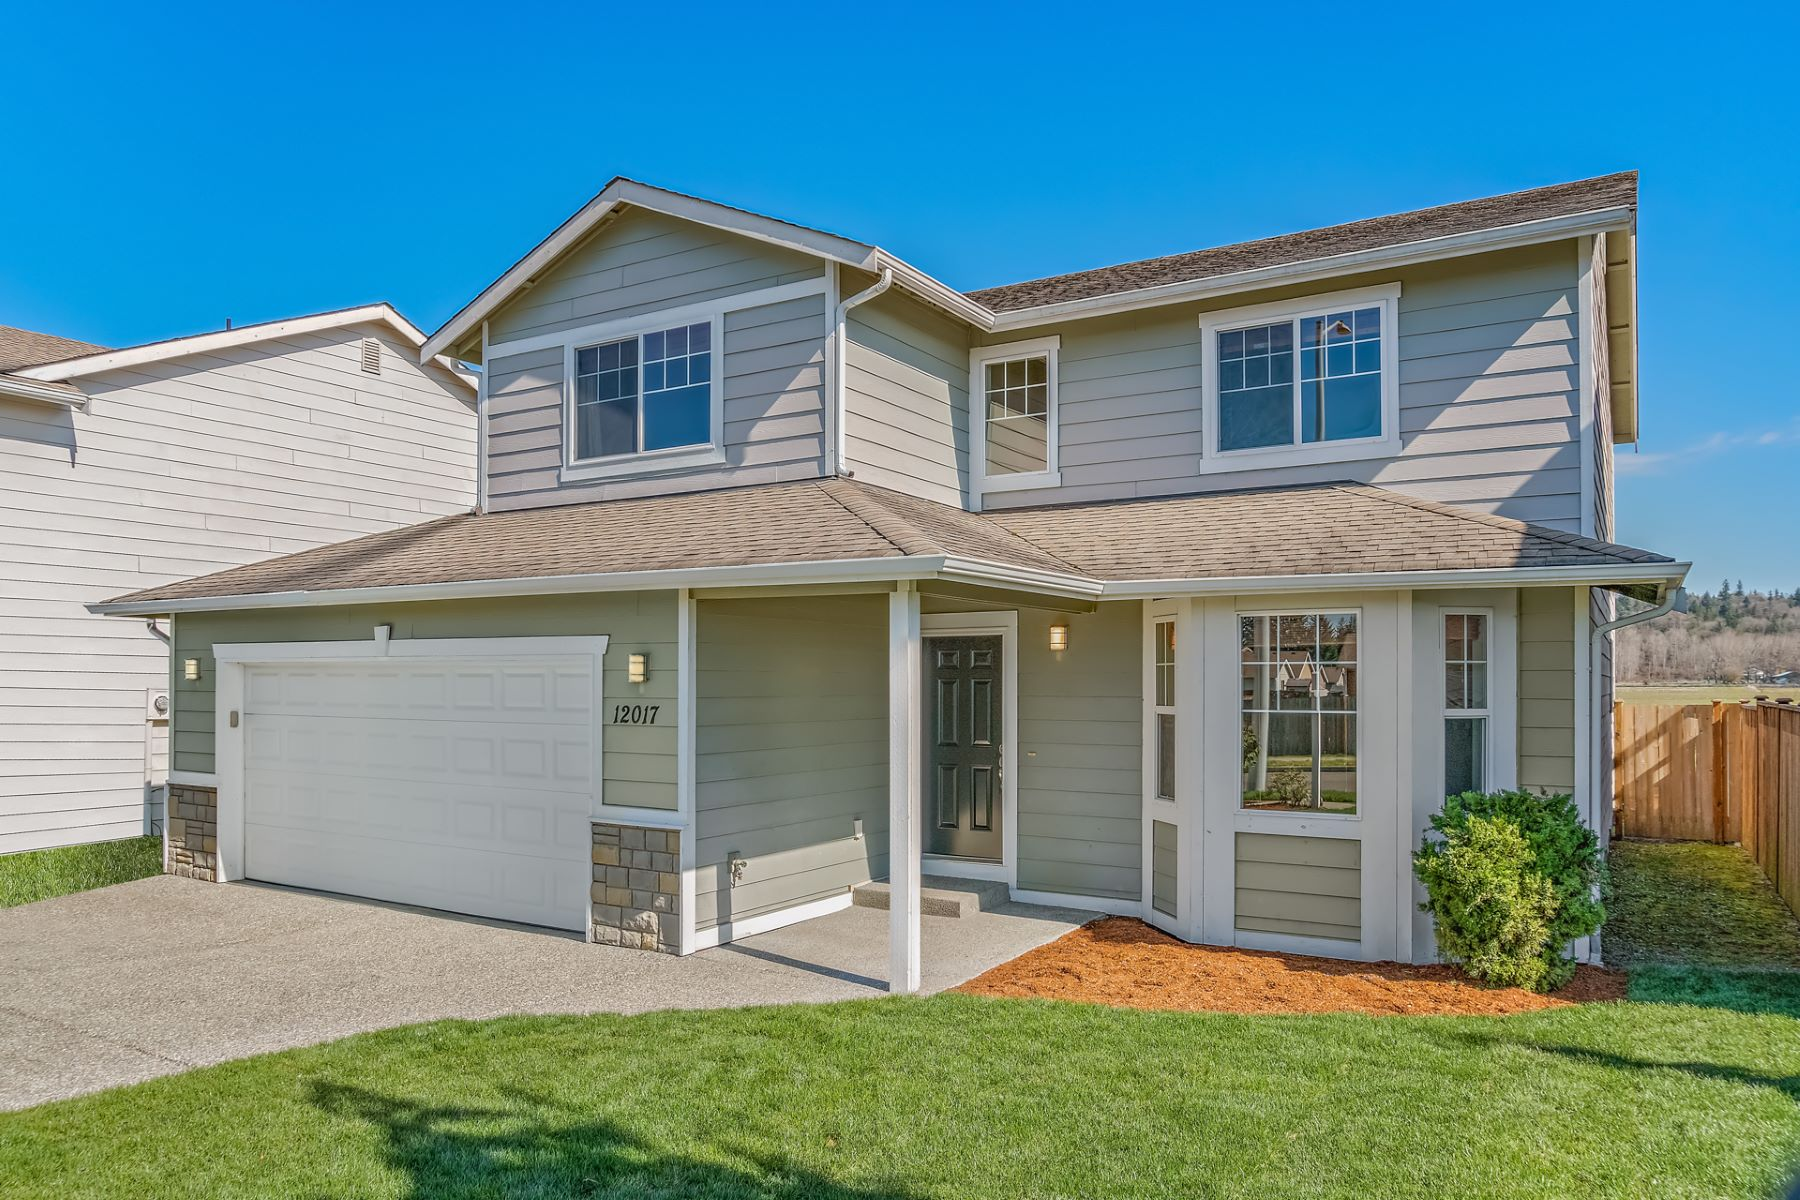 Single Family Homes por un Venta en Meadows at Two Cedars 12017 58th Dr NE Marysville, Washington 98271 Estados Unidos